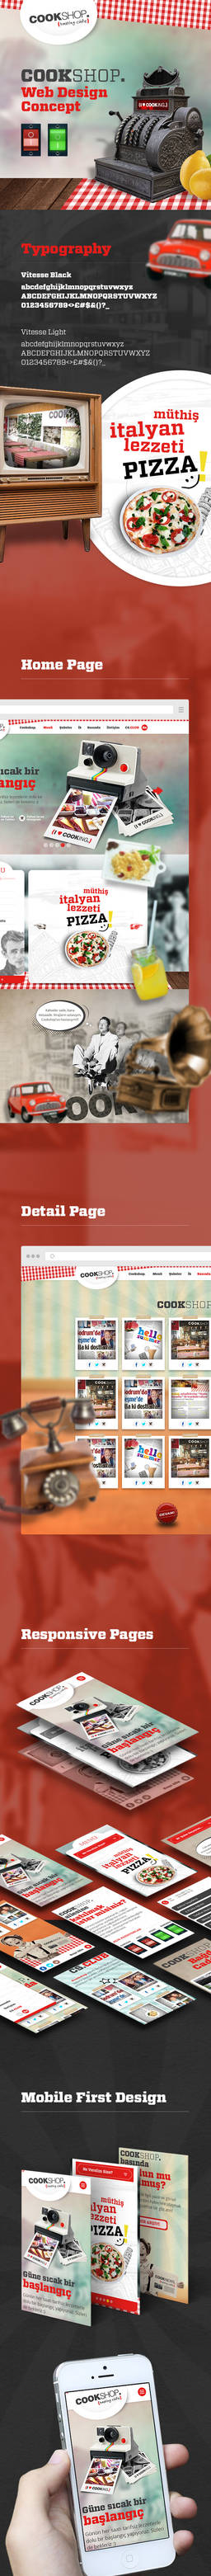 CookShop Web Design Presentation